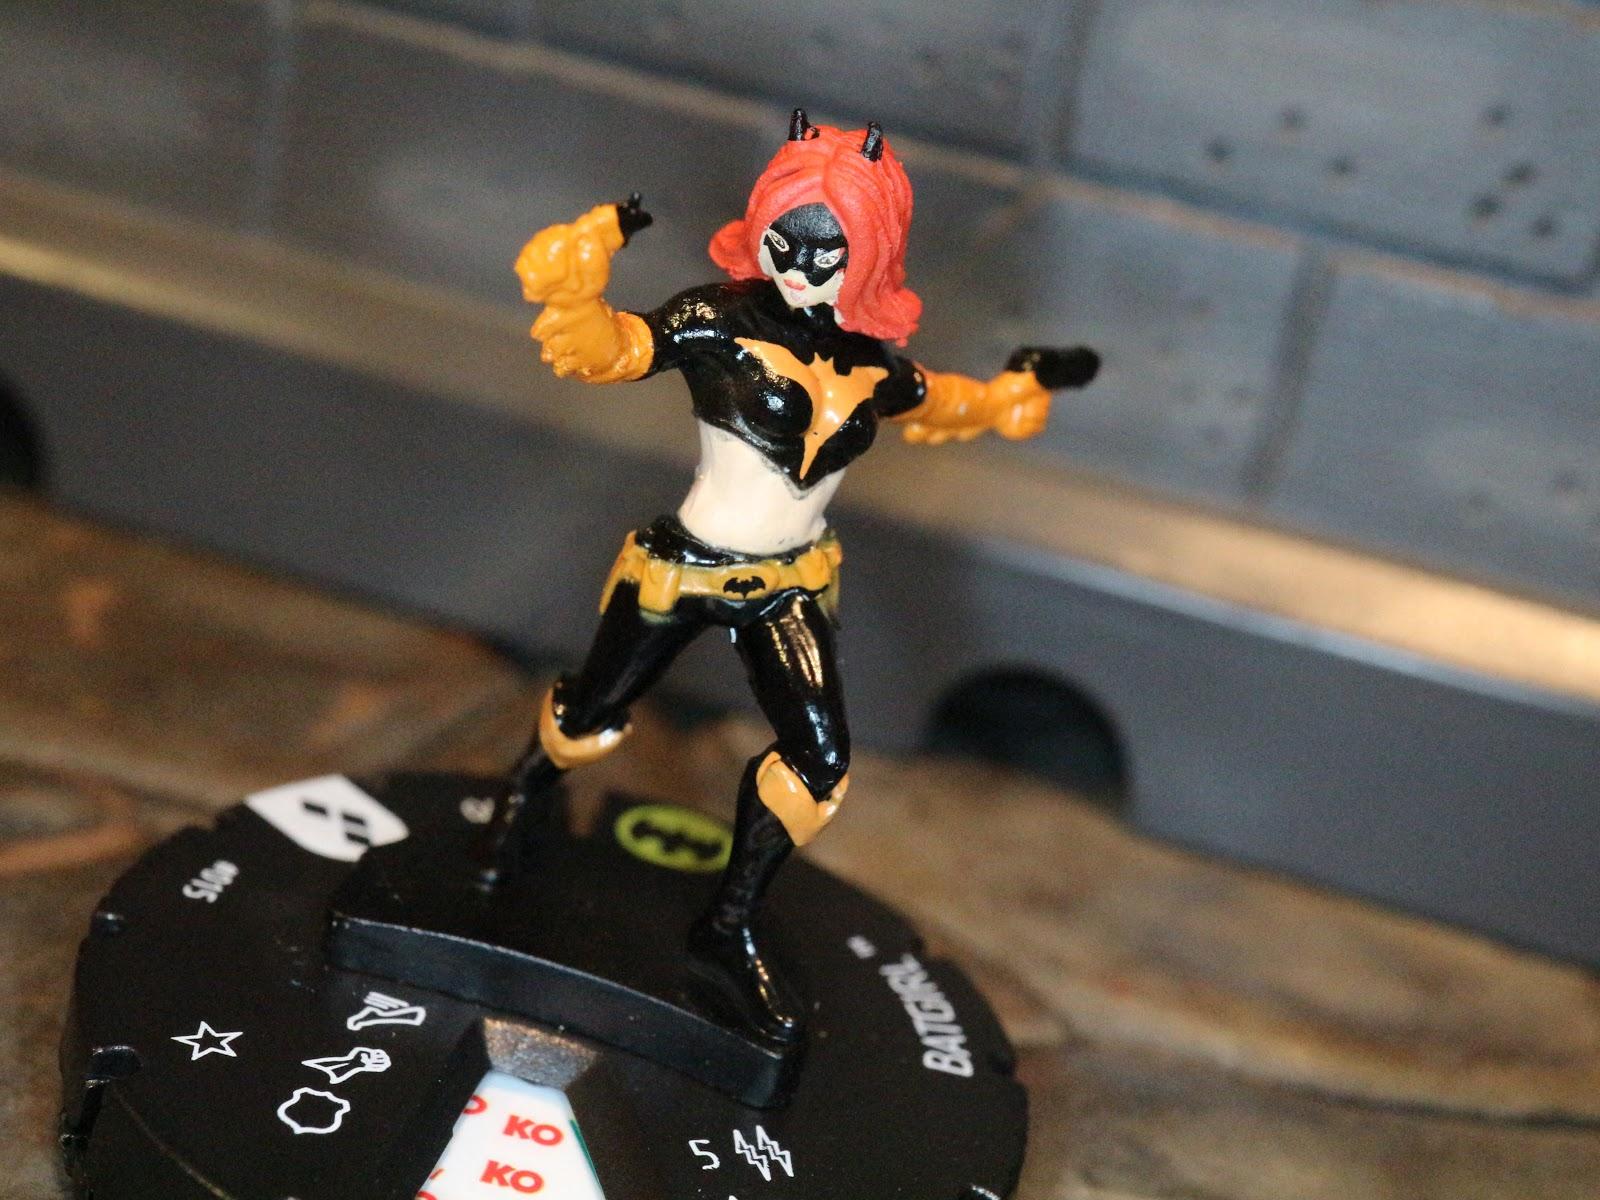 WizKids DC Heroclix Harley Quinn Gotham Girls 015 Thrillkiller Batgirl